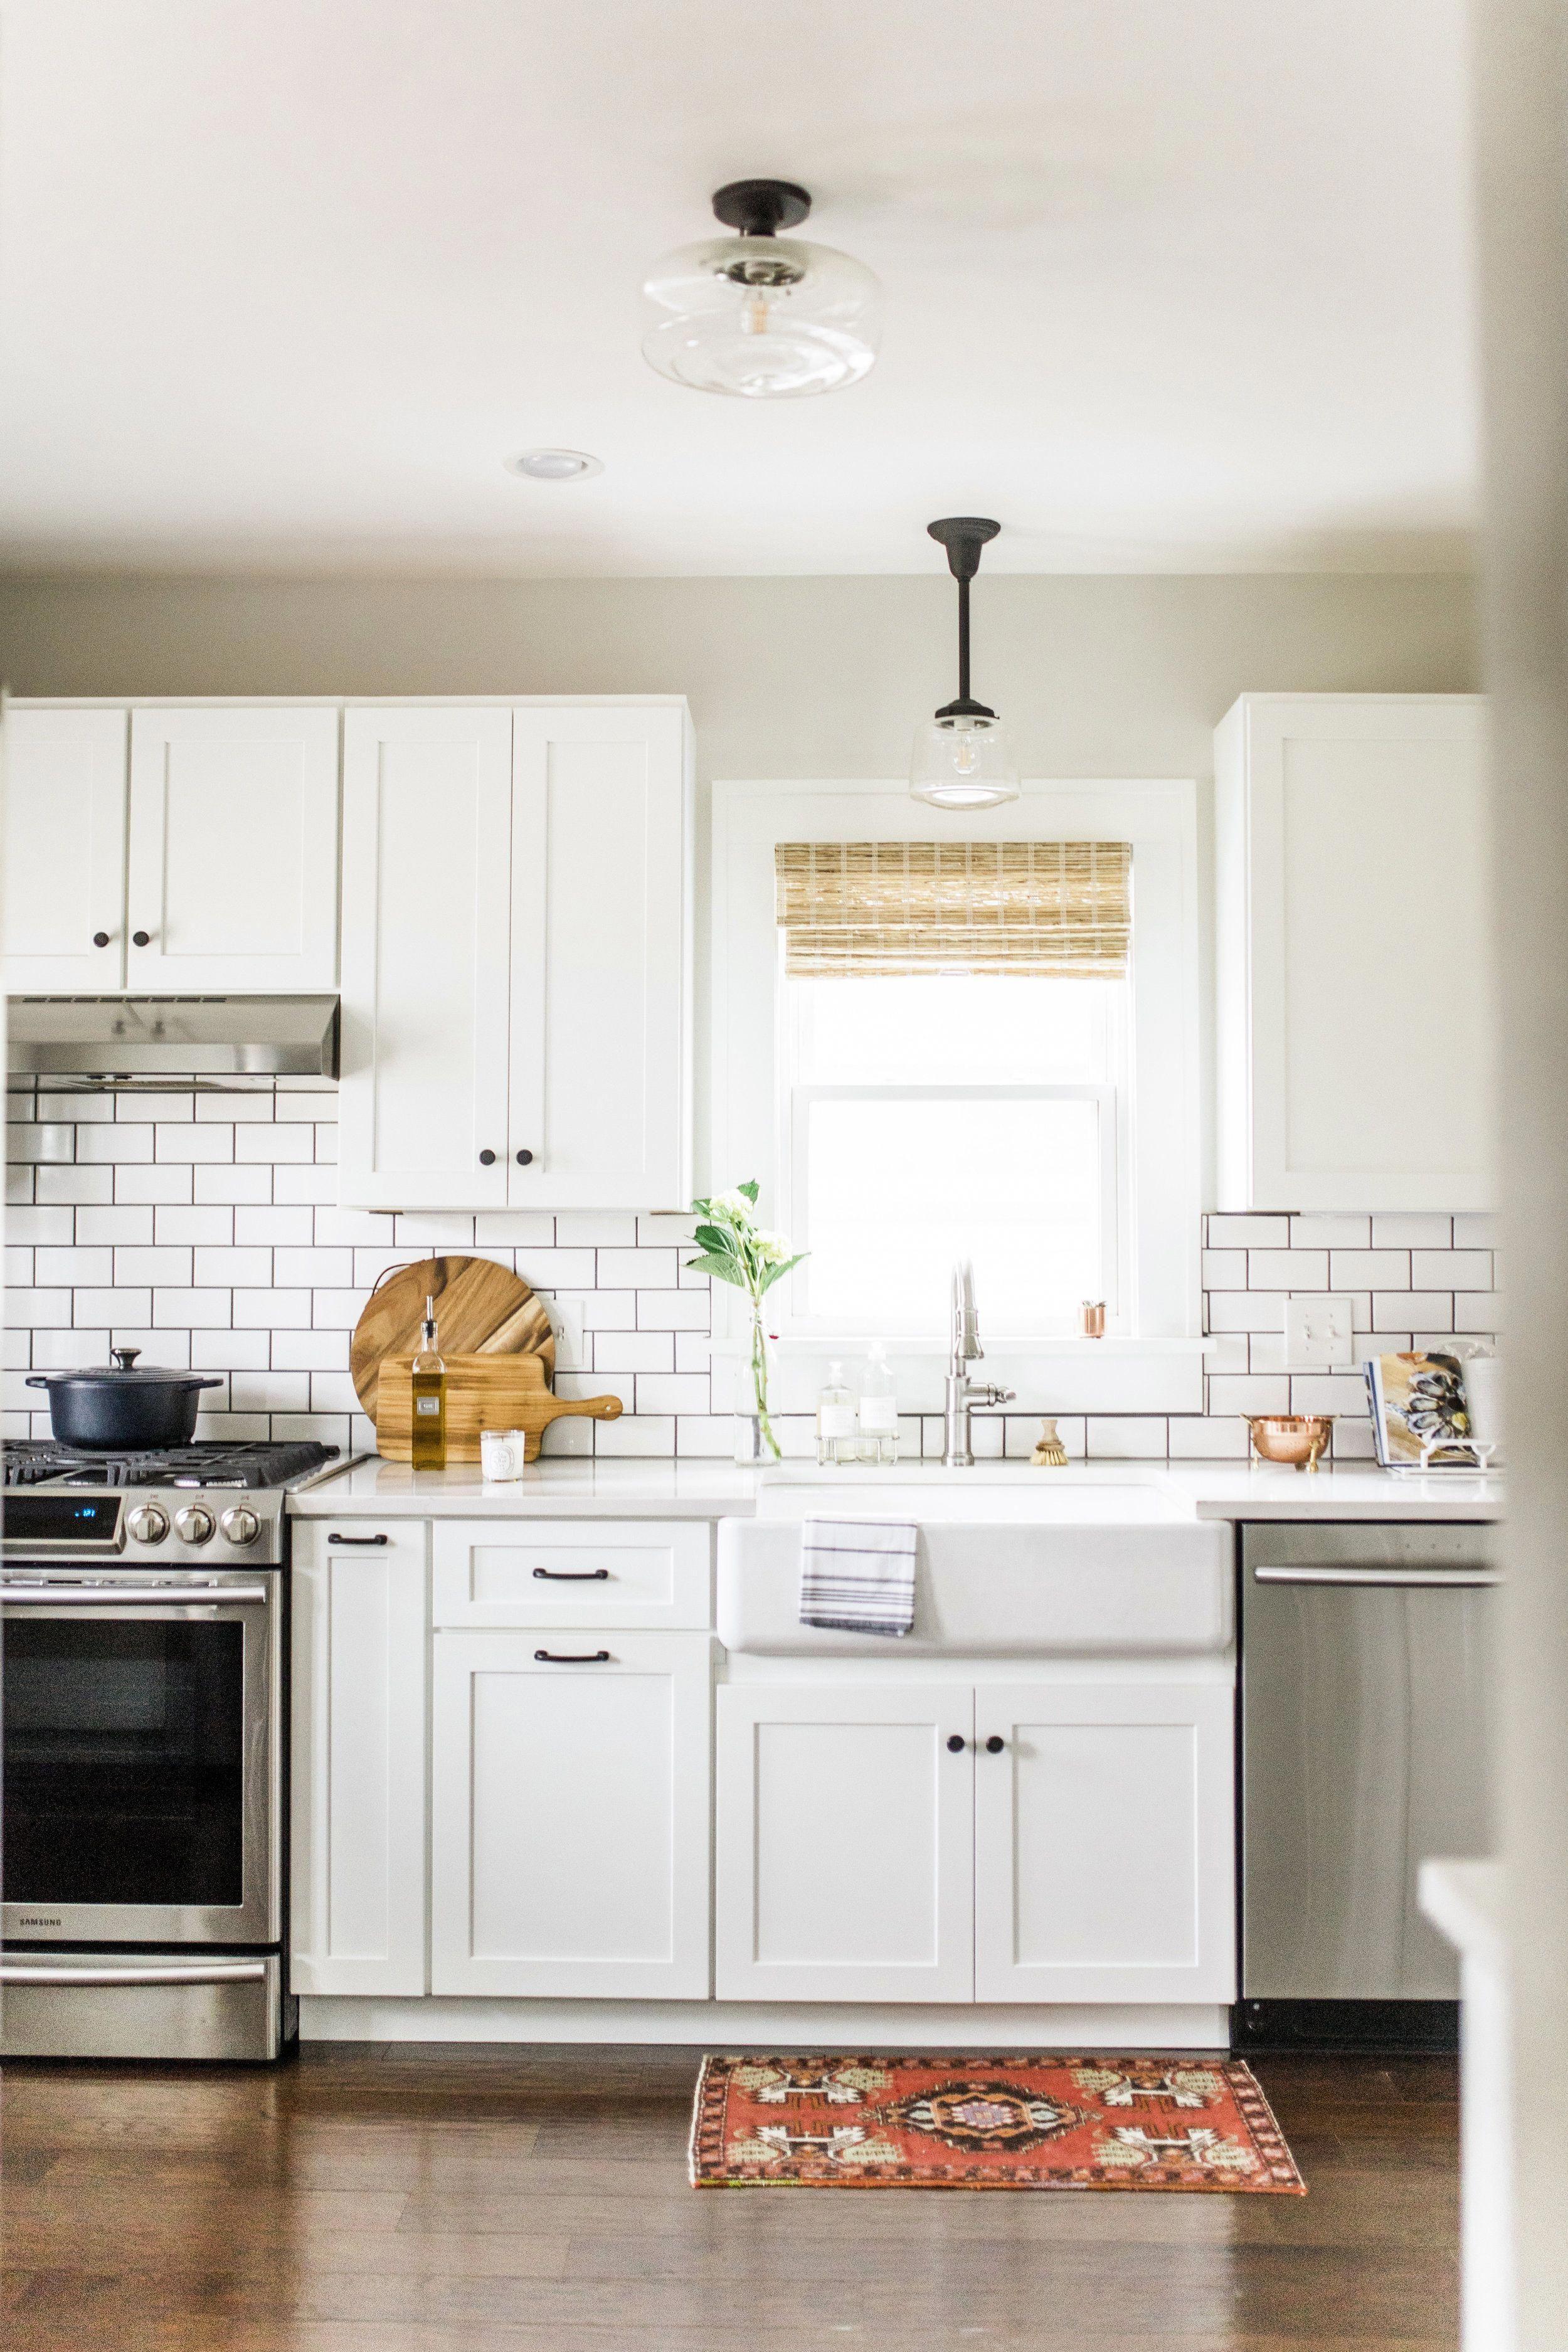 kitchensetmurah diy kitchen ideas on a budget